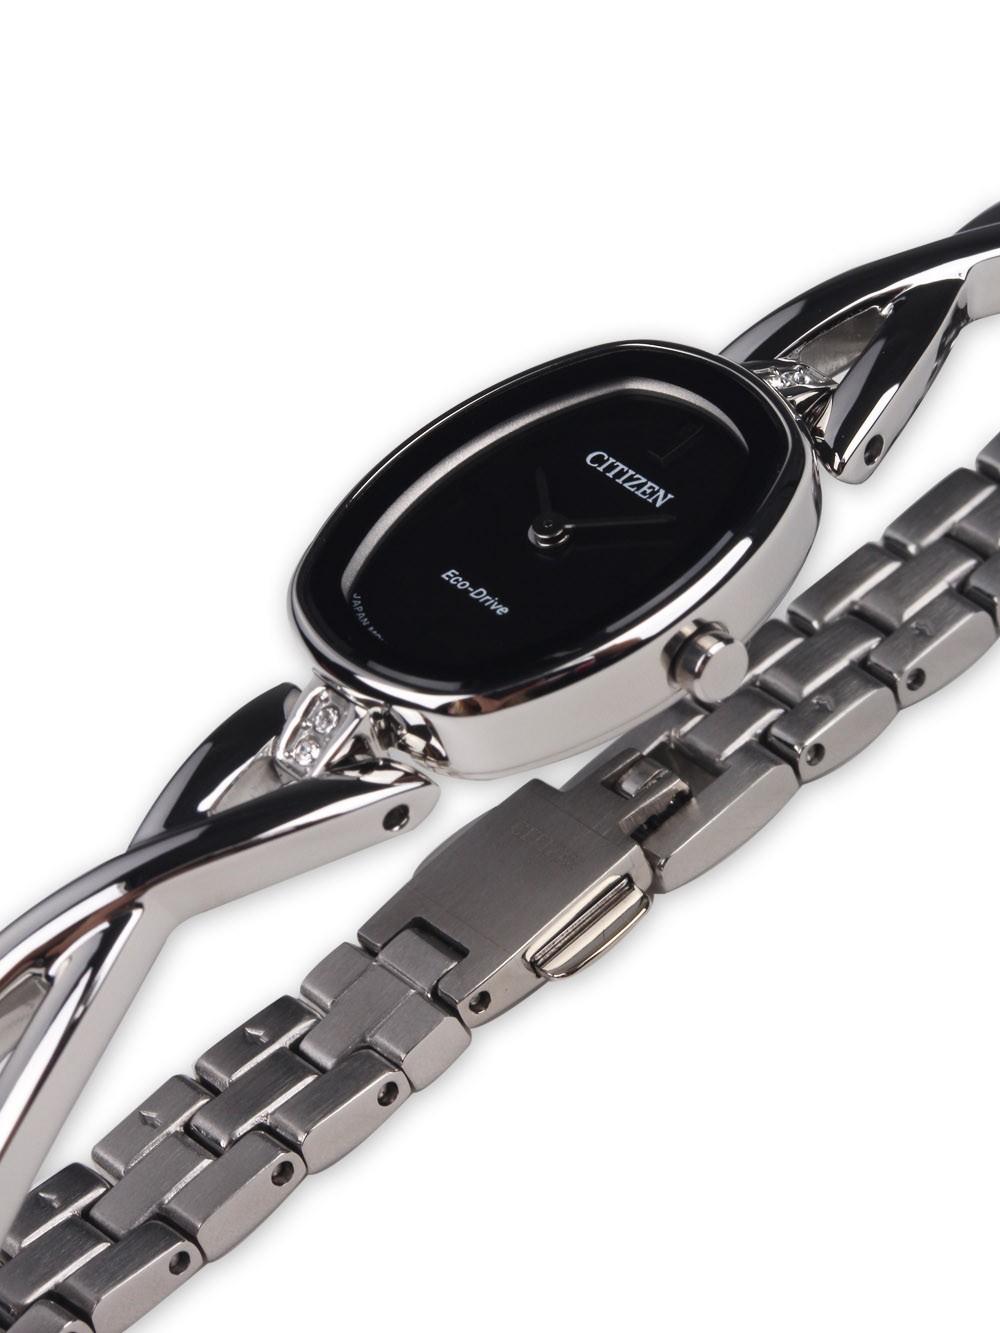 watches chrono12 citizen ex1410 88e elegant eco drive damen 18mm 3atm. Black Bedroom Furniture Sets. Home Design Ideas